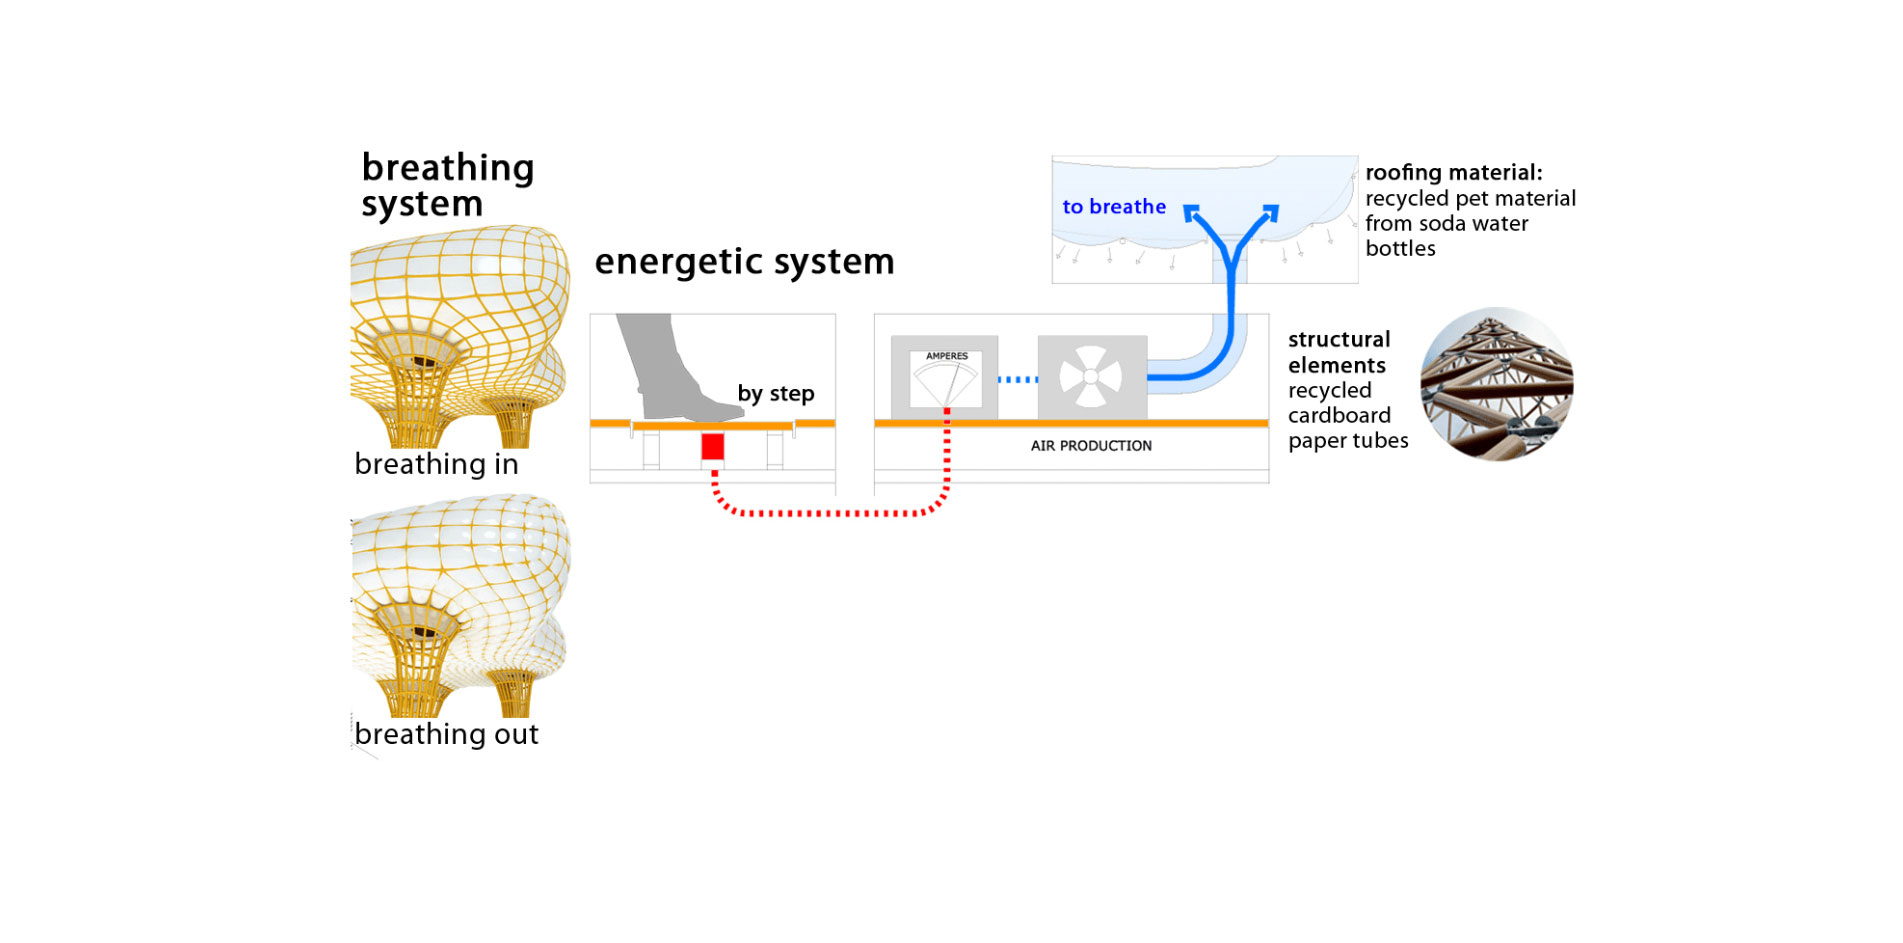 breathing system